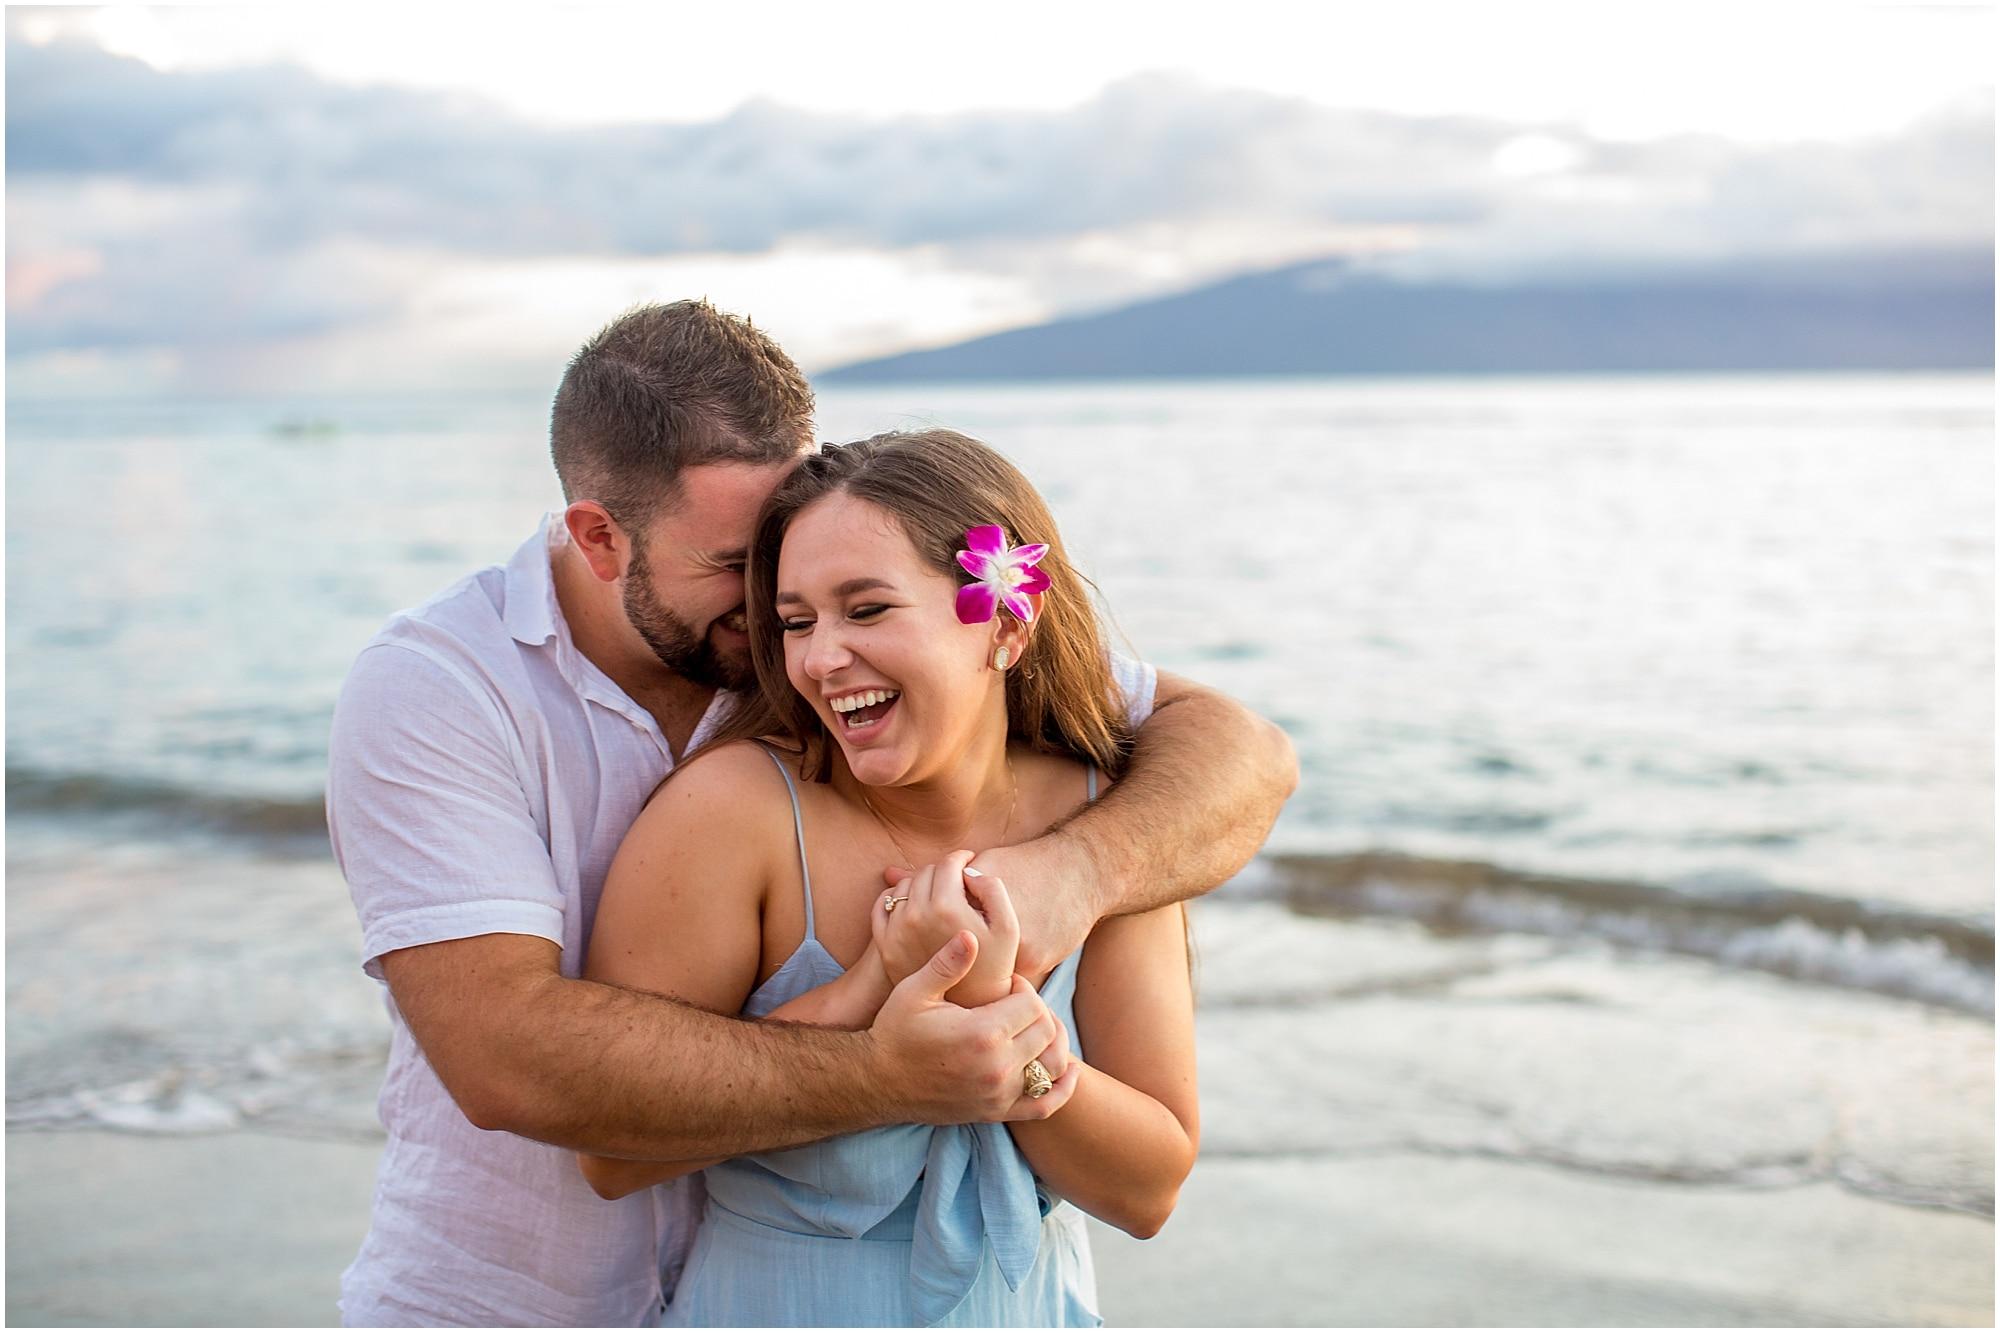 Cuddling on the beach